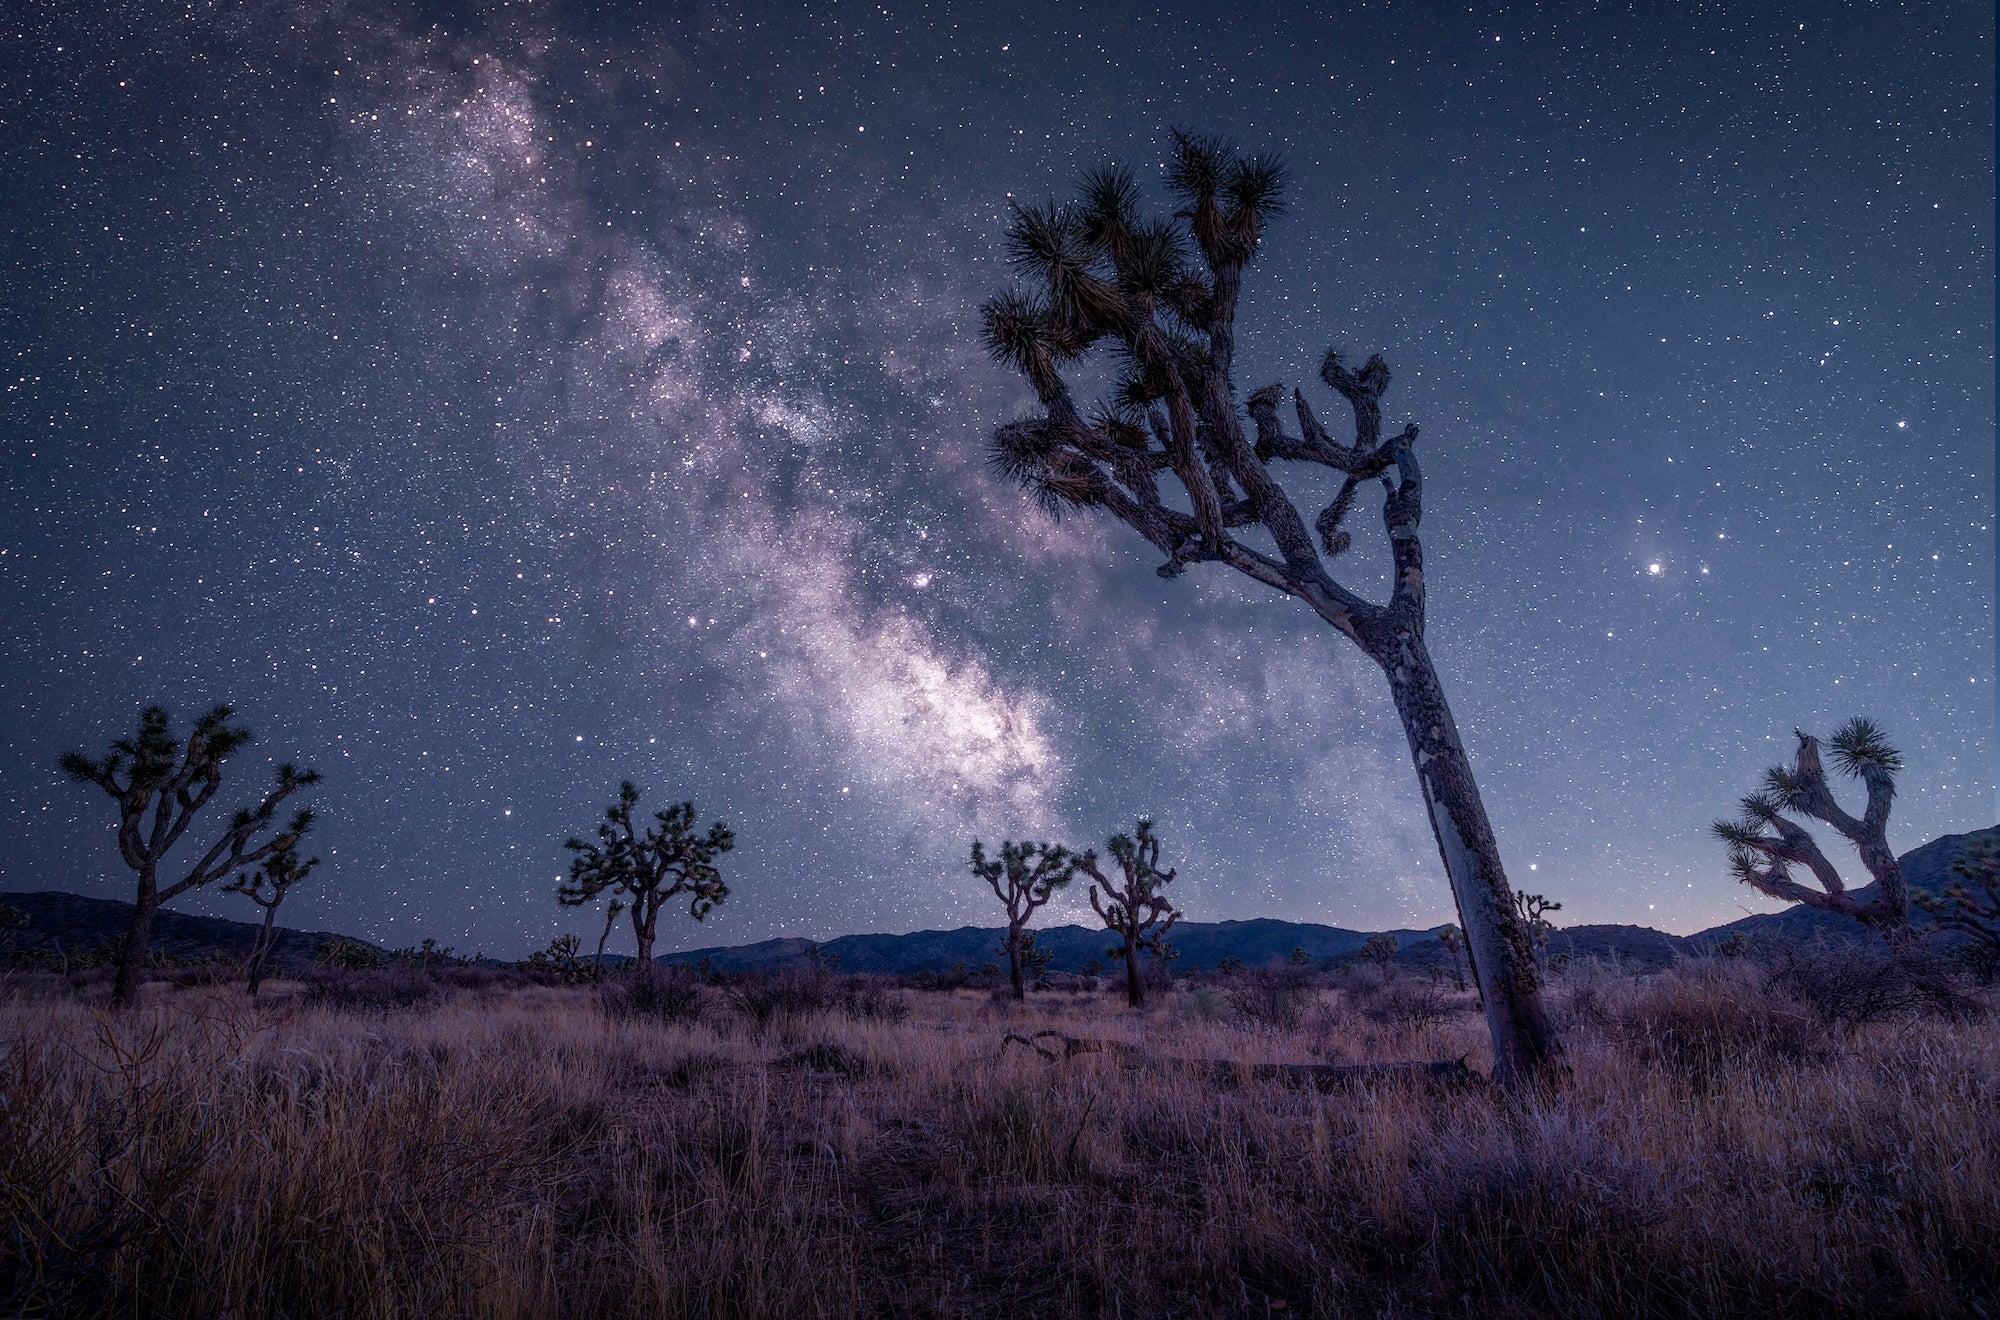 Photo by Michael Castaneda. Sony α7R III. Sony 16-35mm f/2.8 G Master. Foreground: 1/8-sec., f/10, ISO 100. Sky: 305-secs., f/2.8, ISO 320